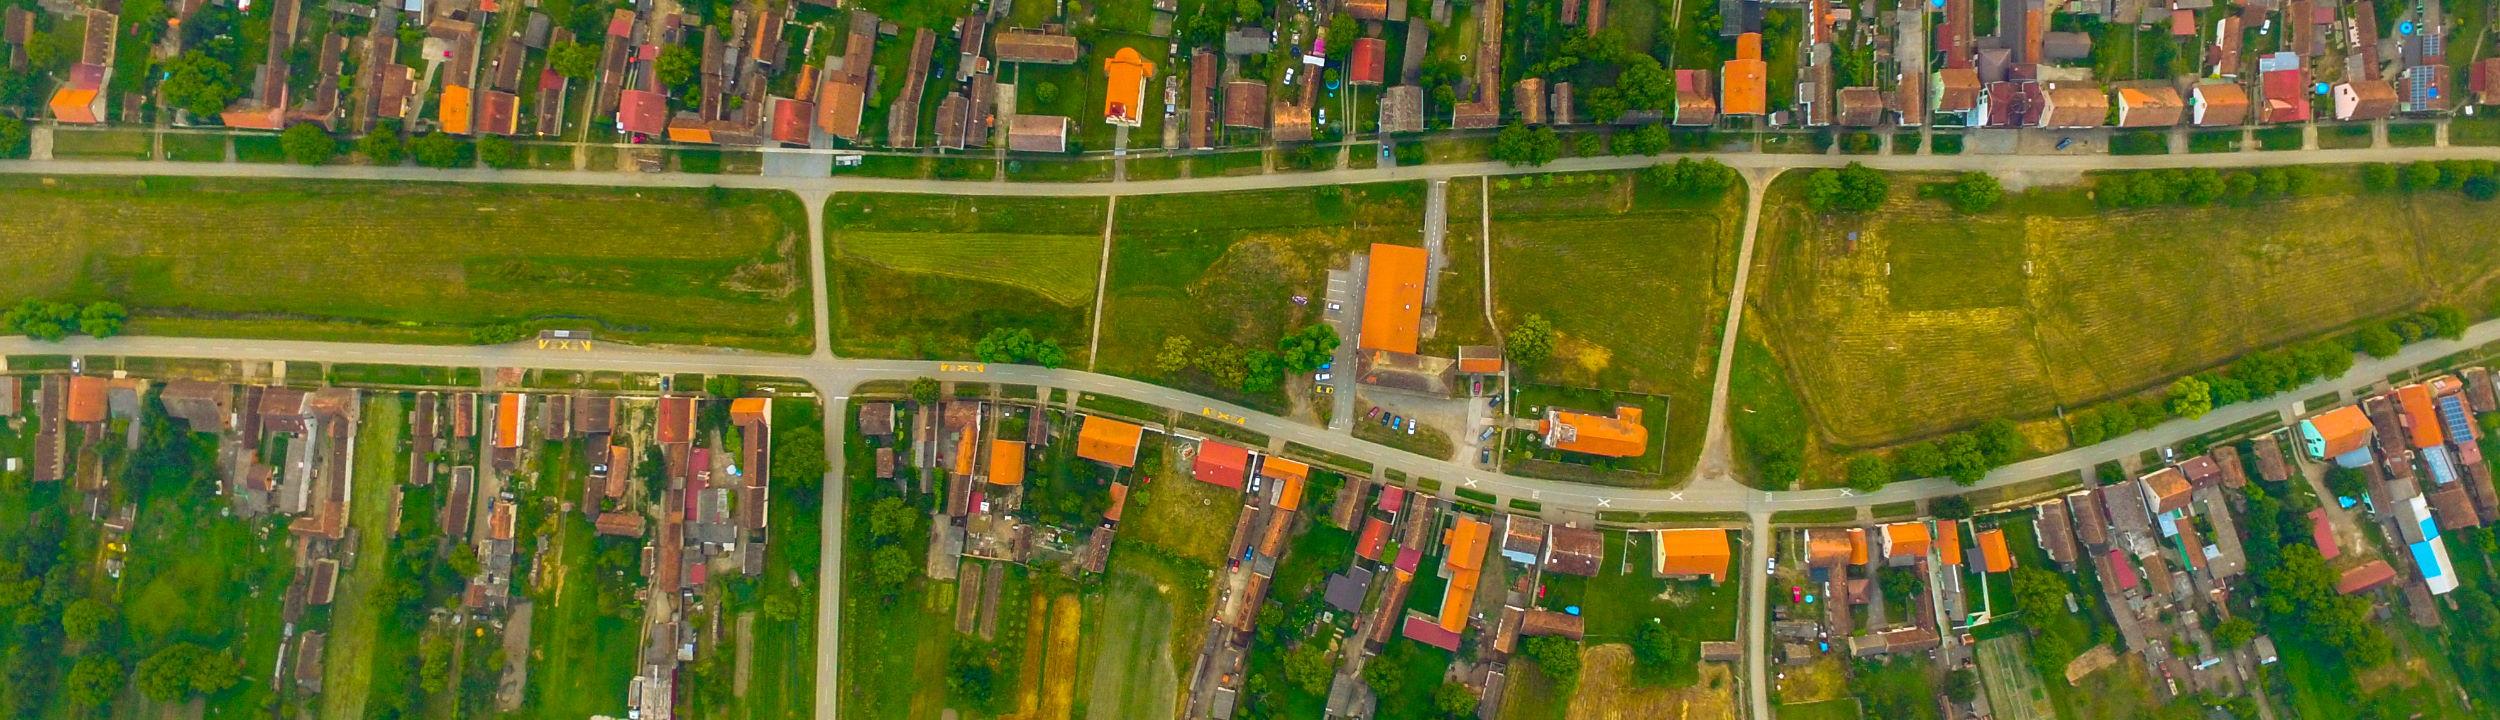 Centar naselja Kaniža iz zraka